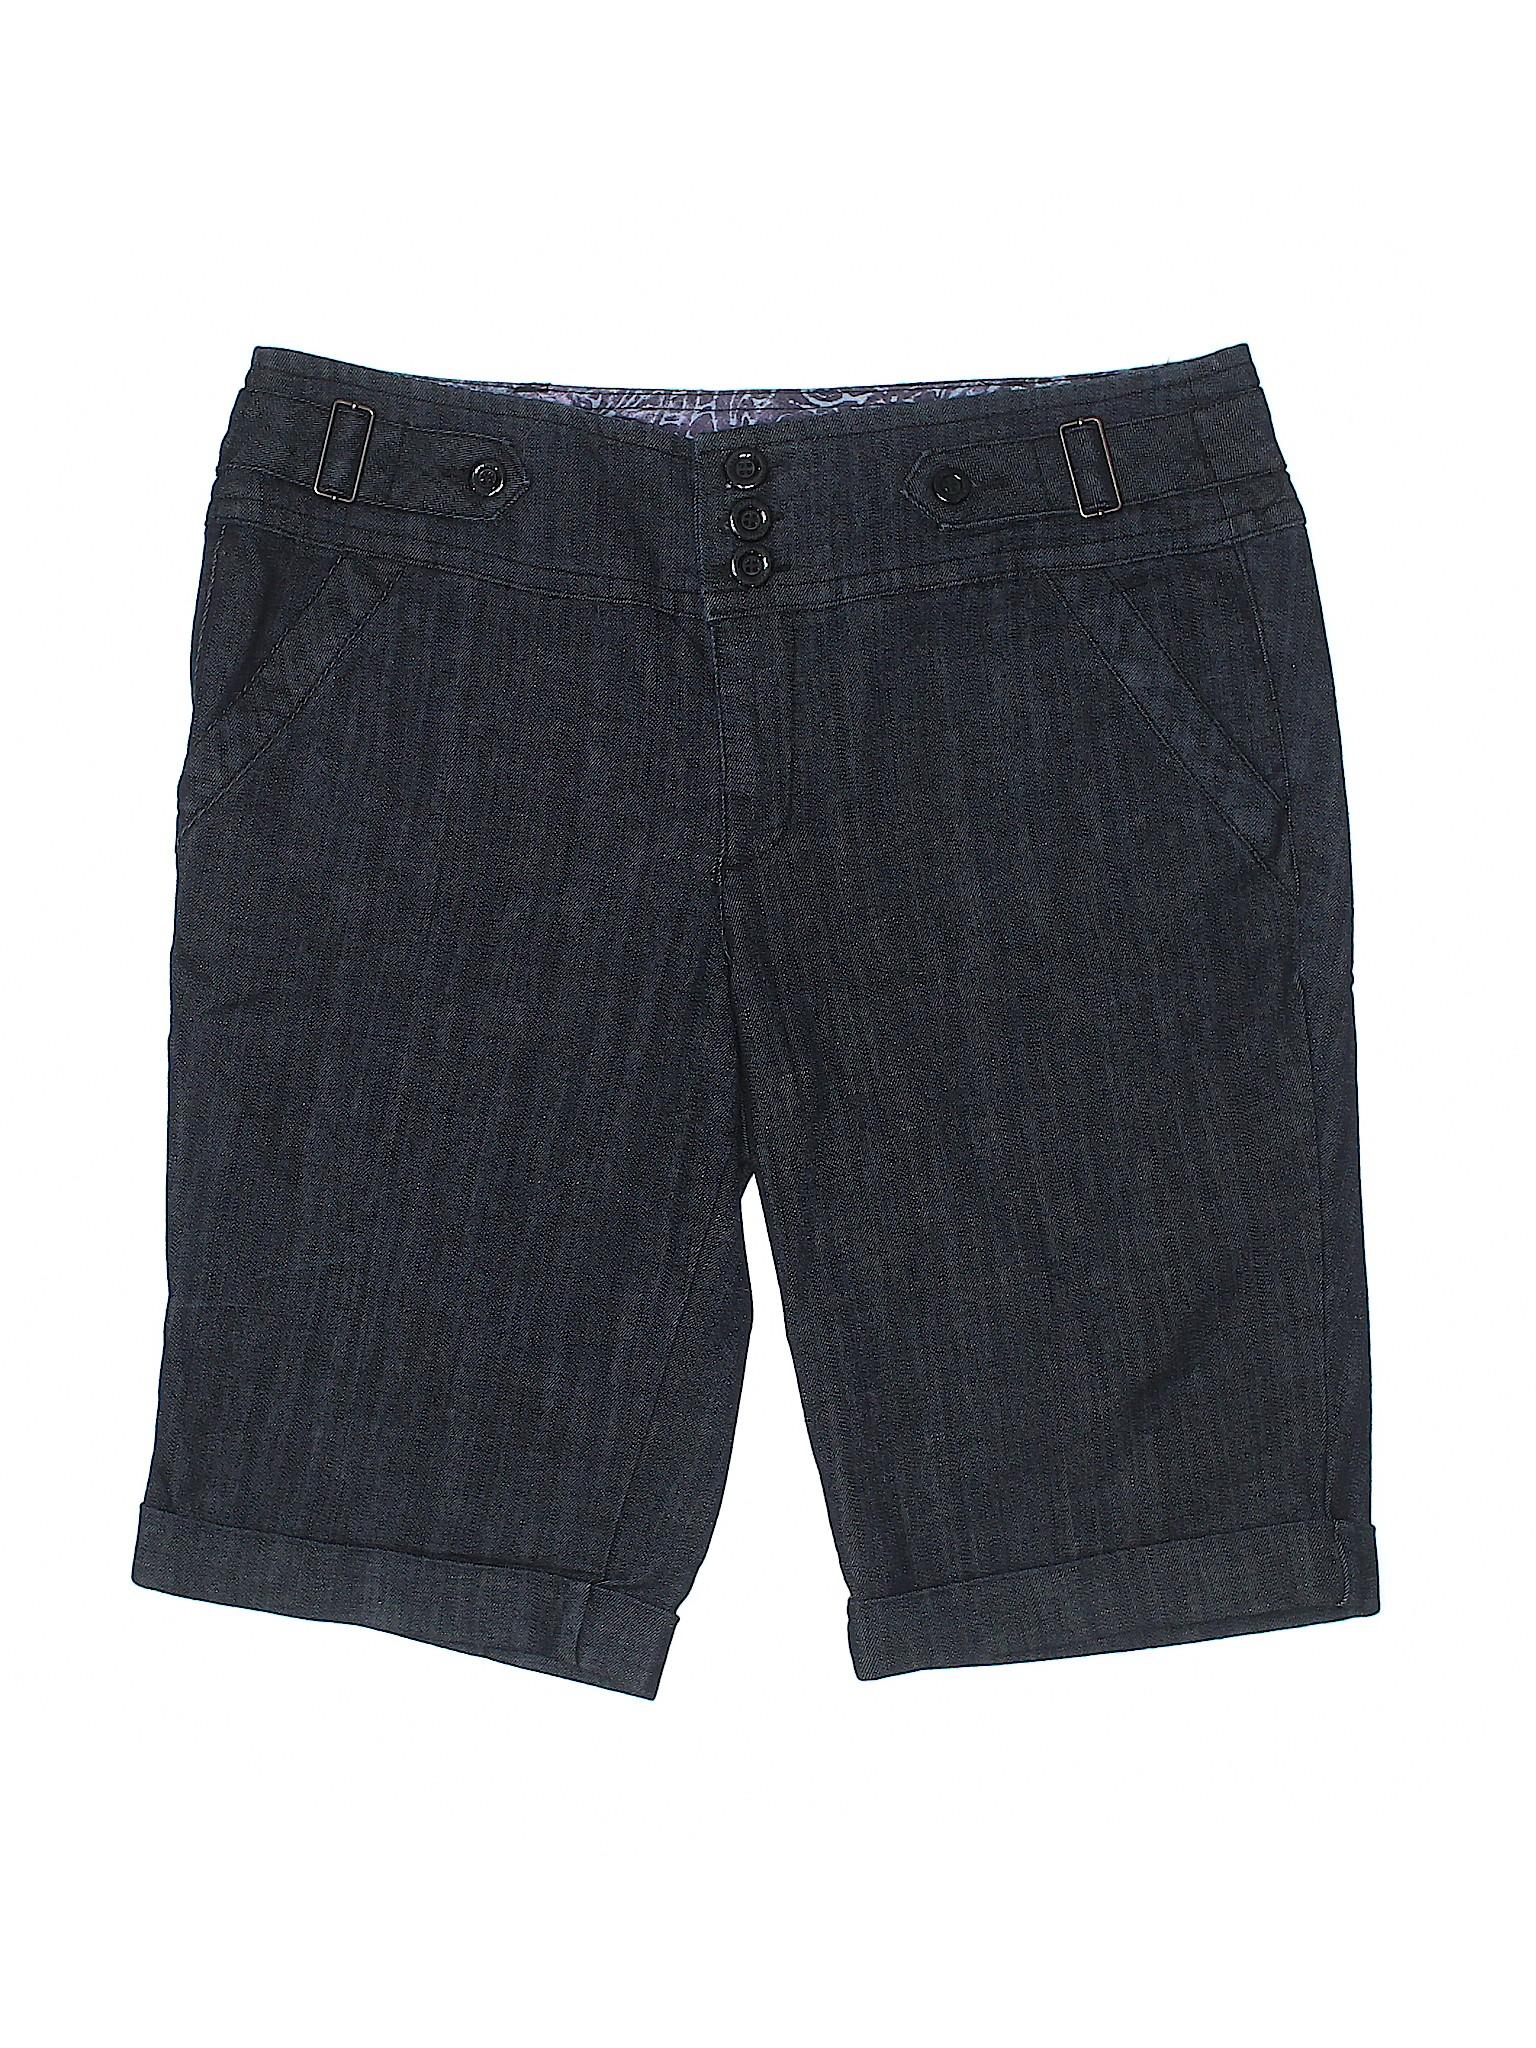 One 5 Denim Boutique Shorts One RW76wpX